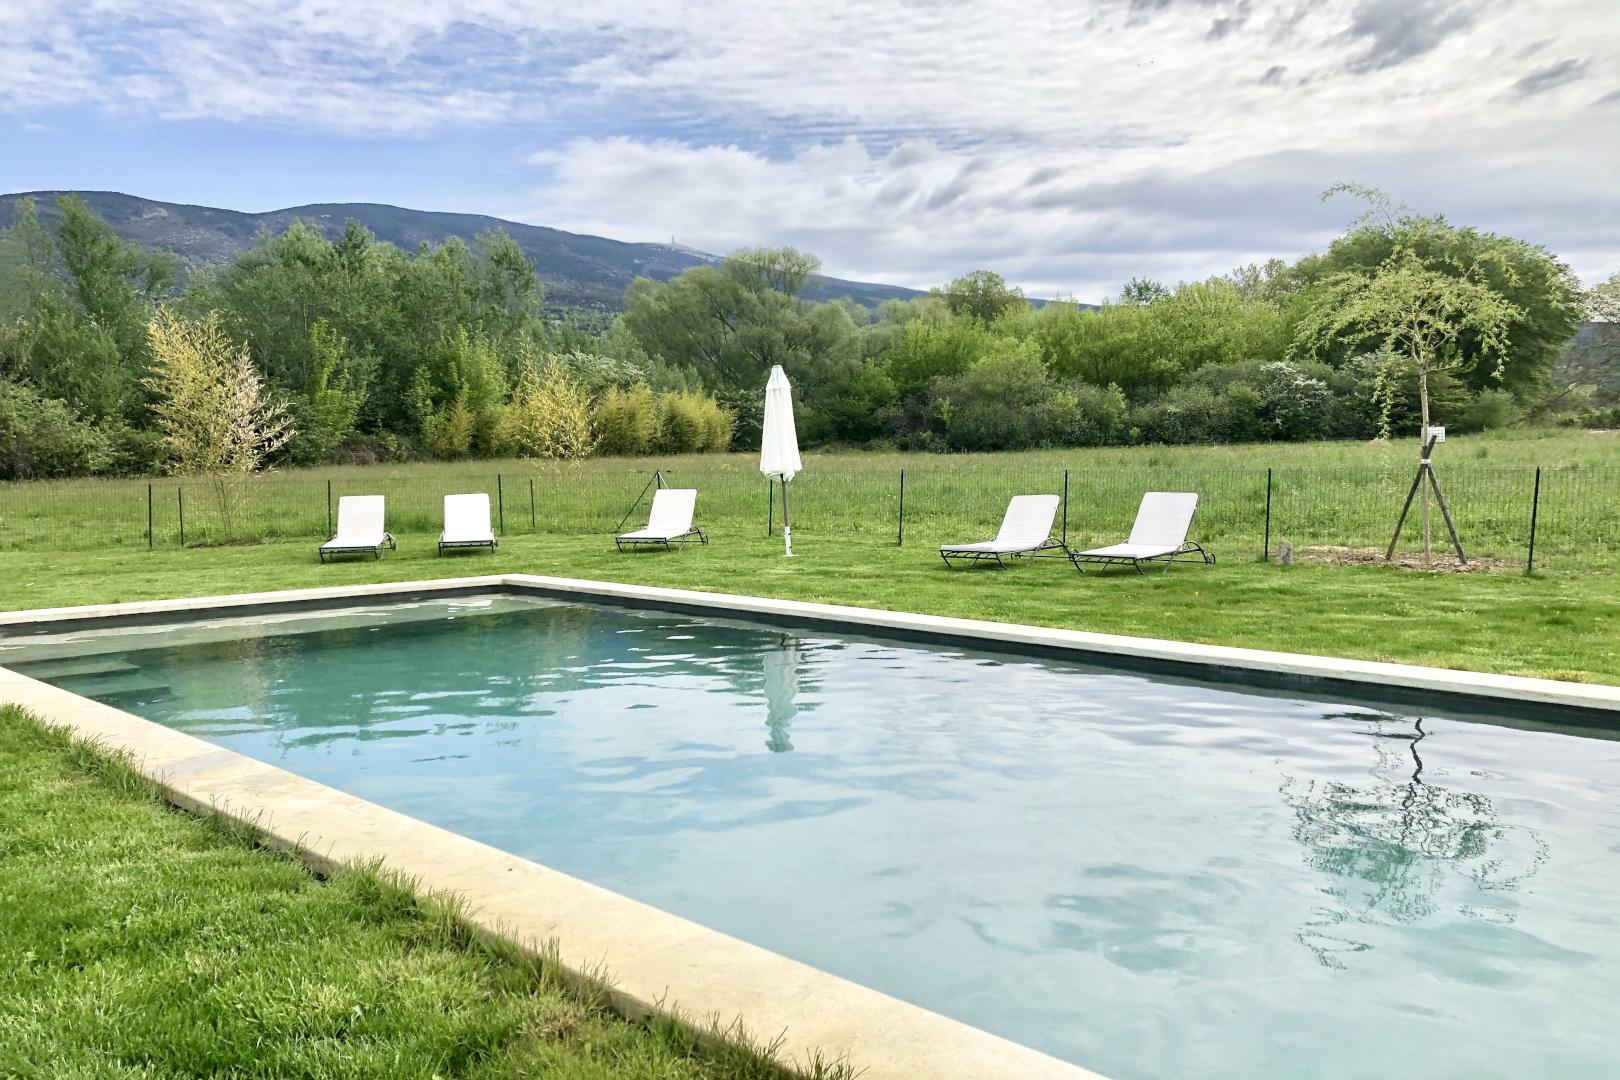 piscine-mont-ventoux